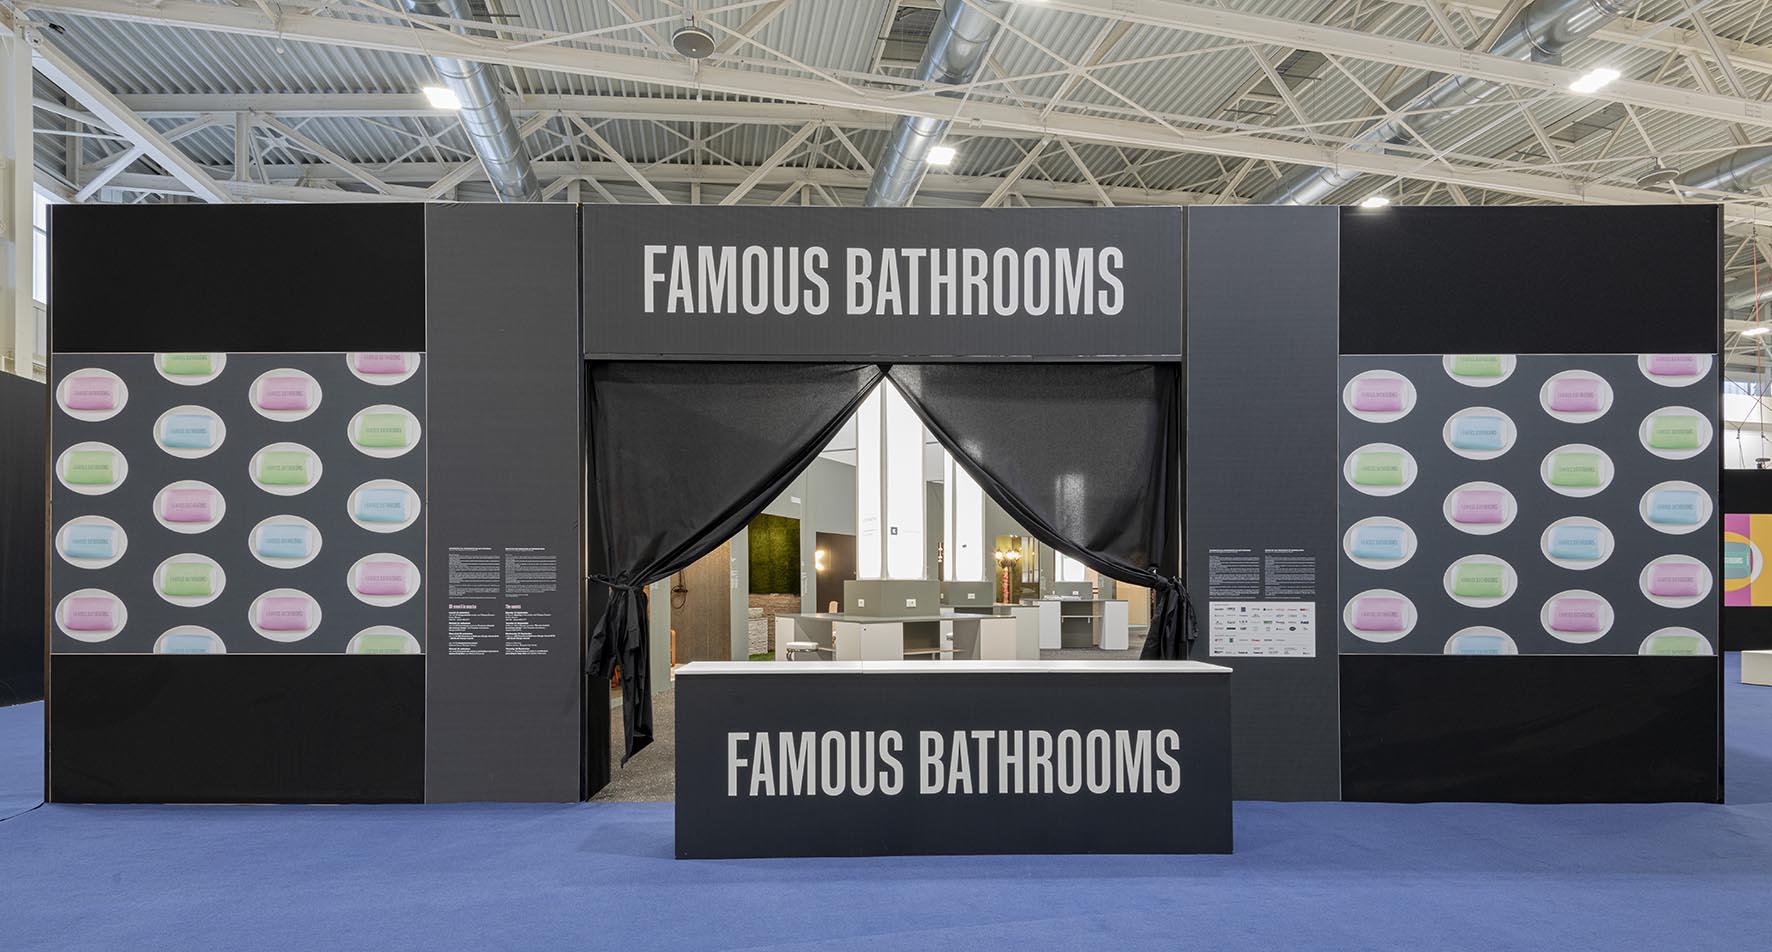 Grande successo per la mostra FAMOUS BATHROOMS al Cersaie 2019